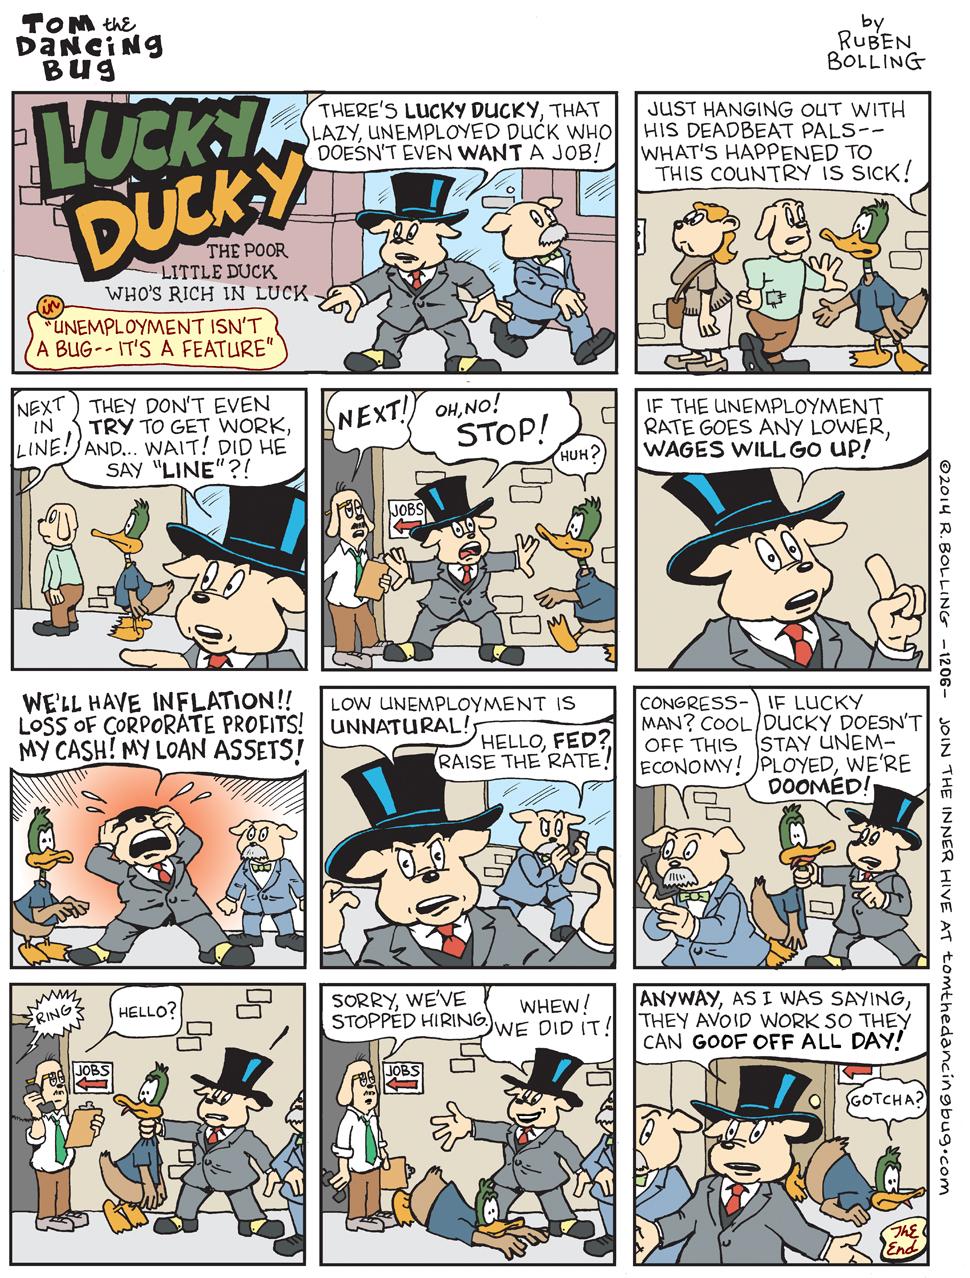 http://media.boingboing.net/wp-content/uploads/2014/09/1206cbCOMIC-lucky-ducky-unemployed1.jpg